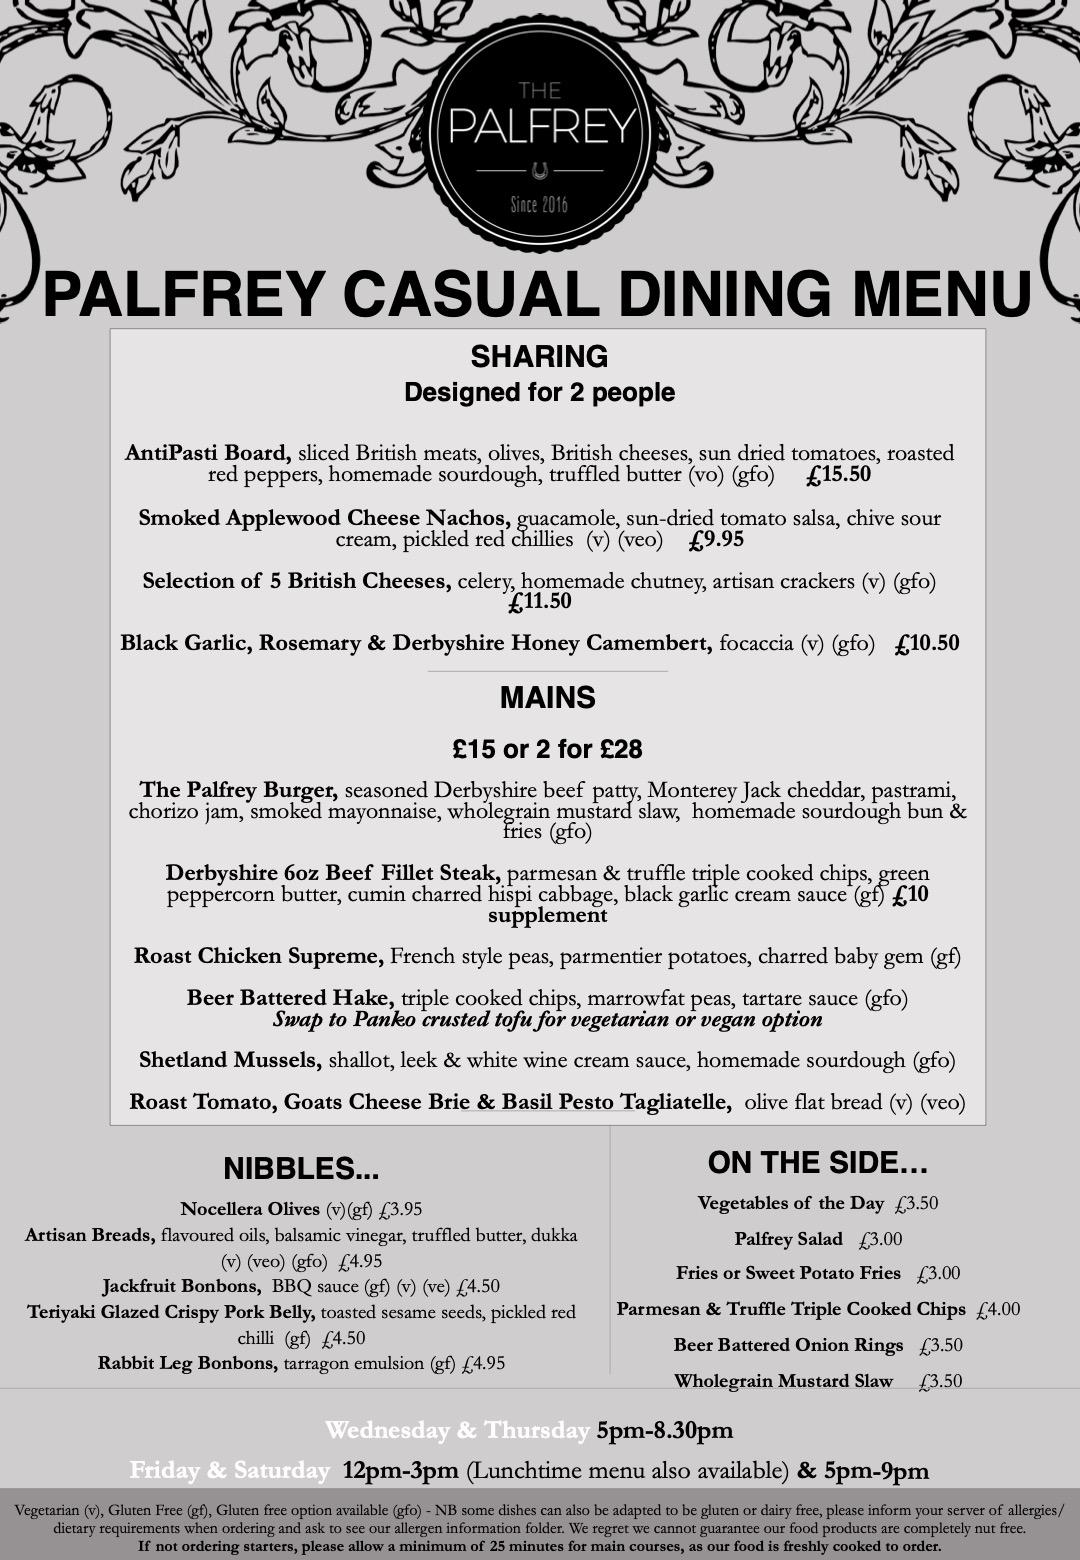 palfrey-casual-dining-menu-1